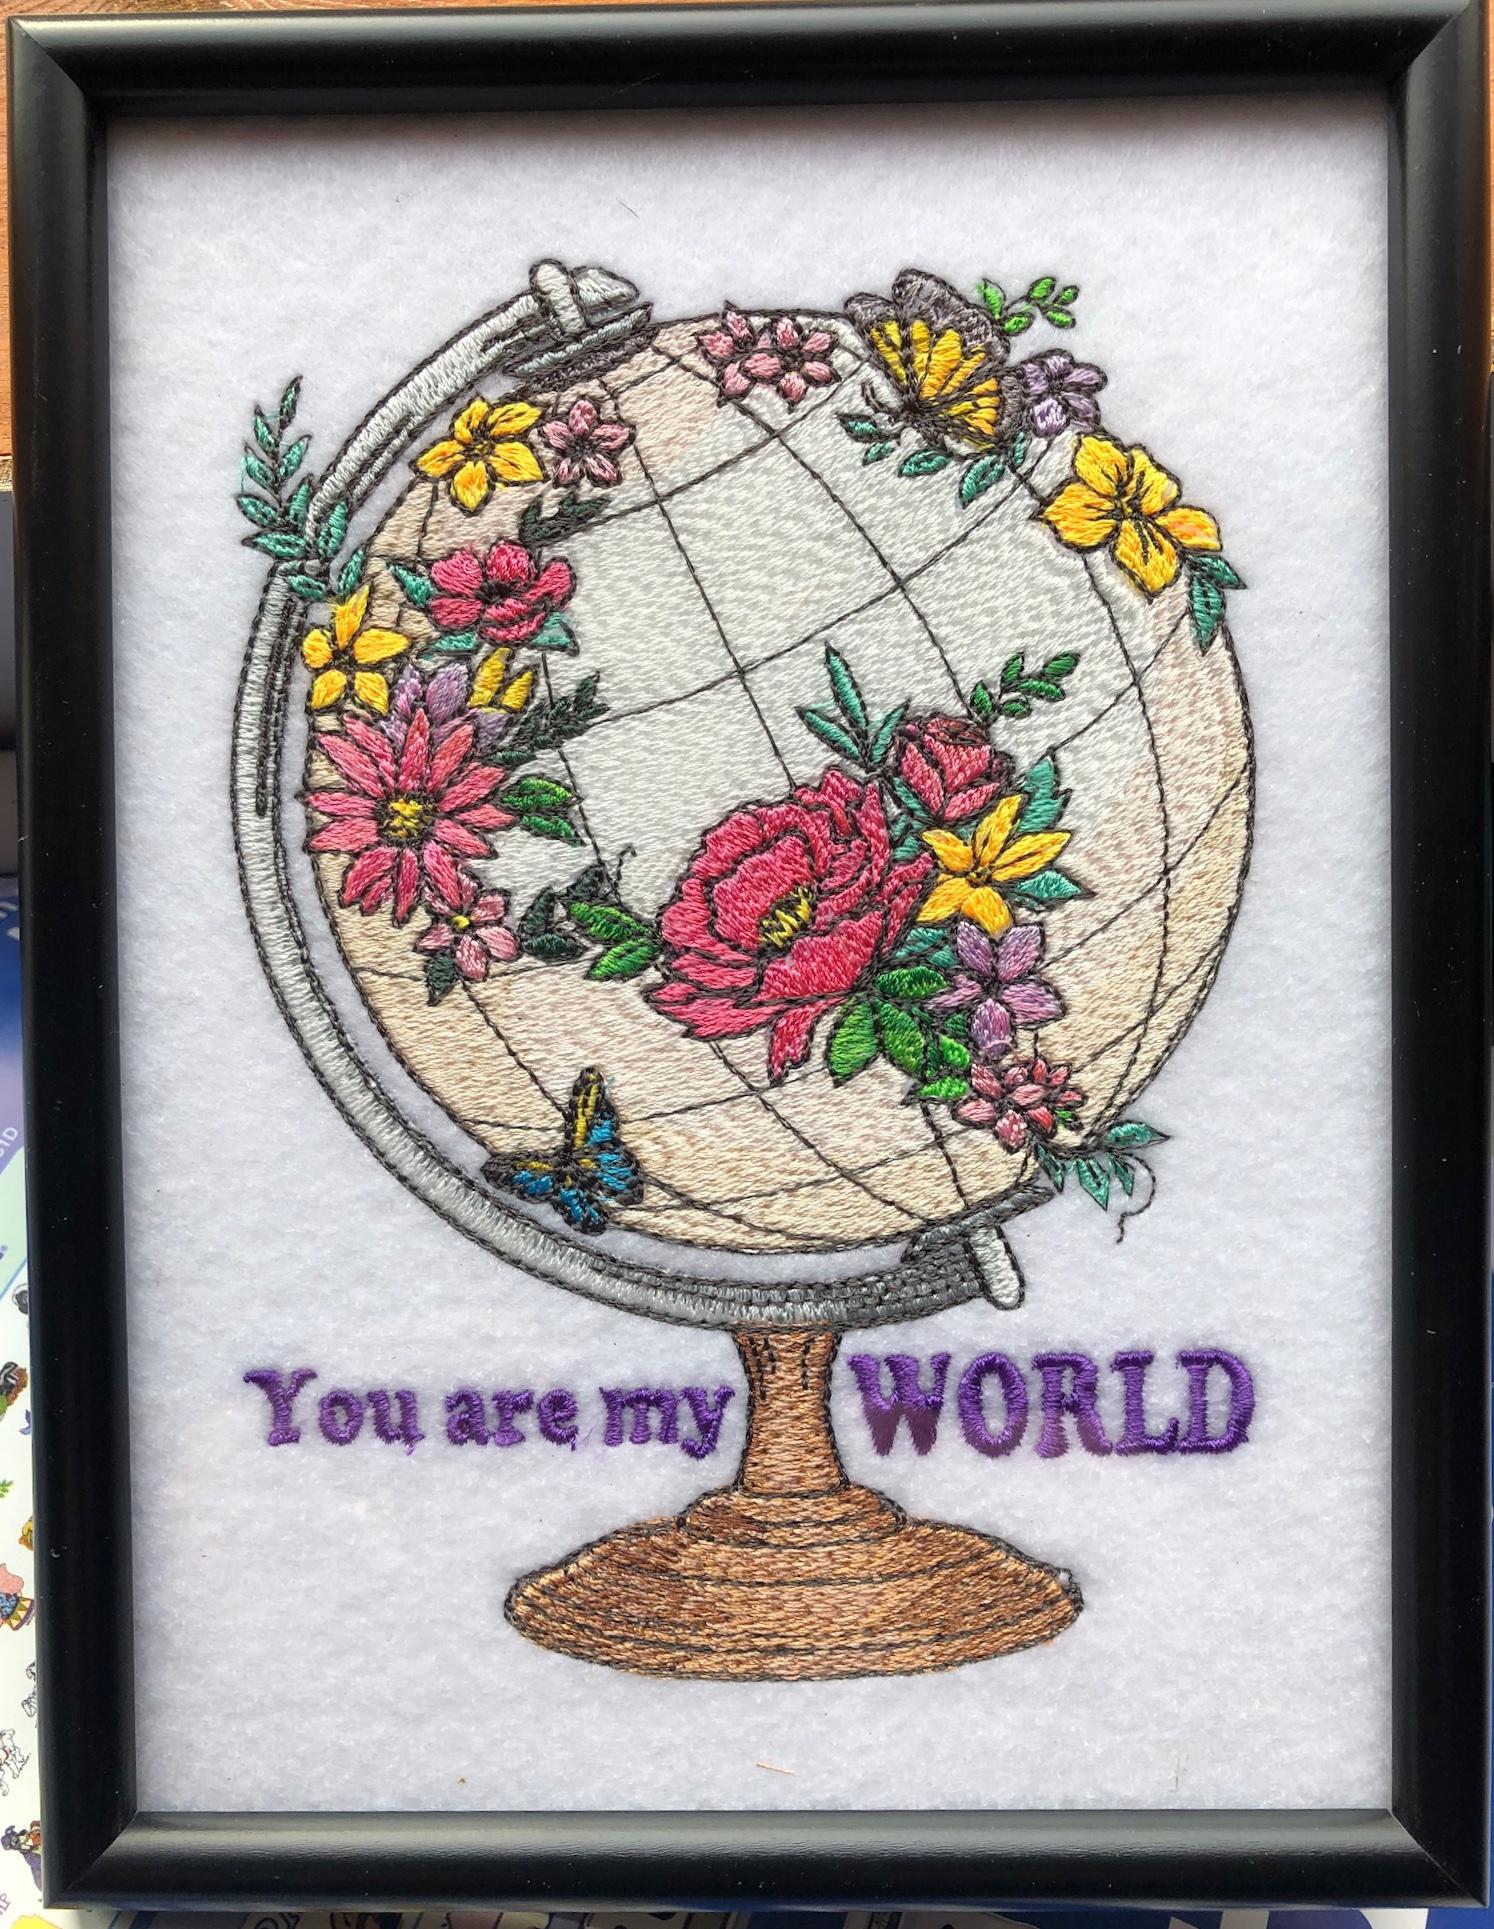 Embroidery/48123400-E448-4D10-83CB-D73F83AEA2EA.jpeg